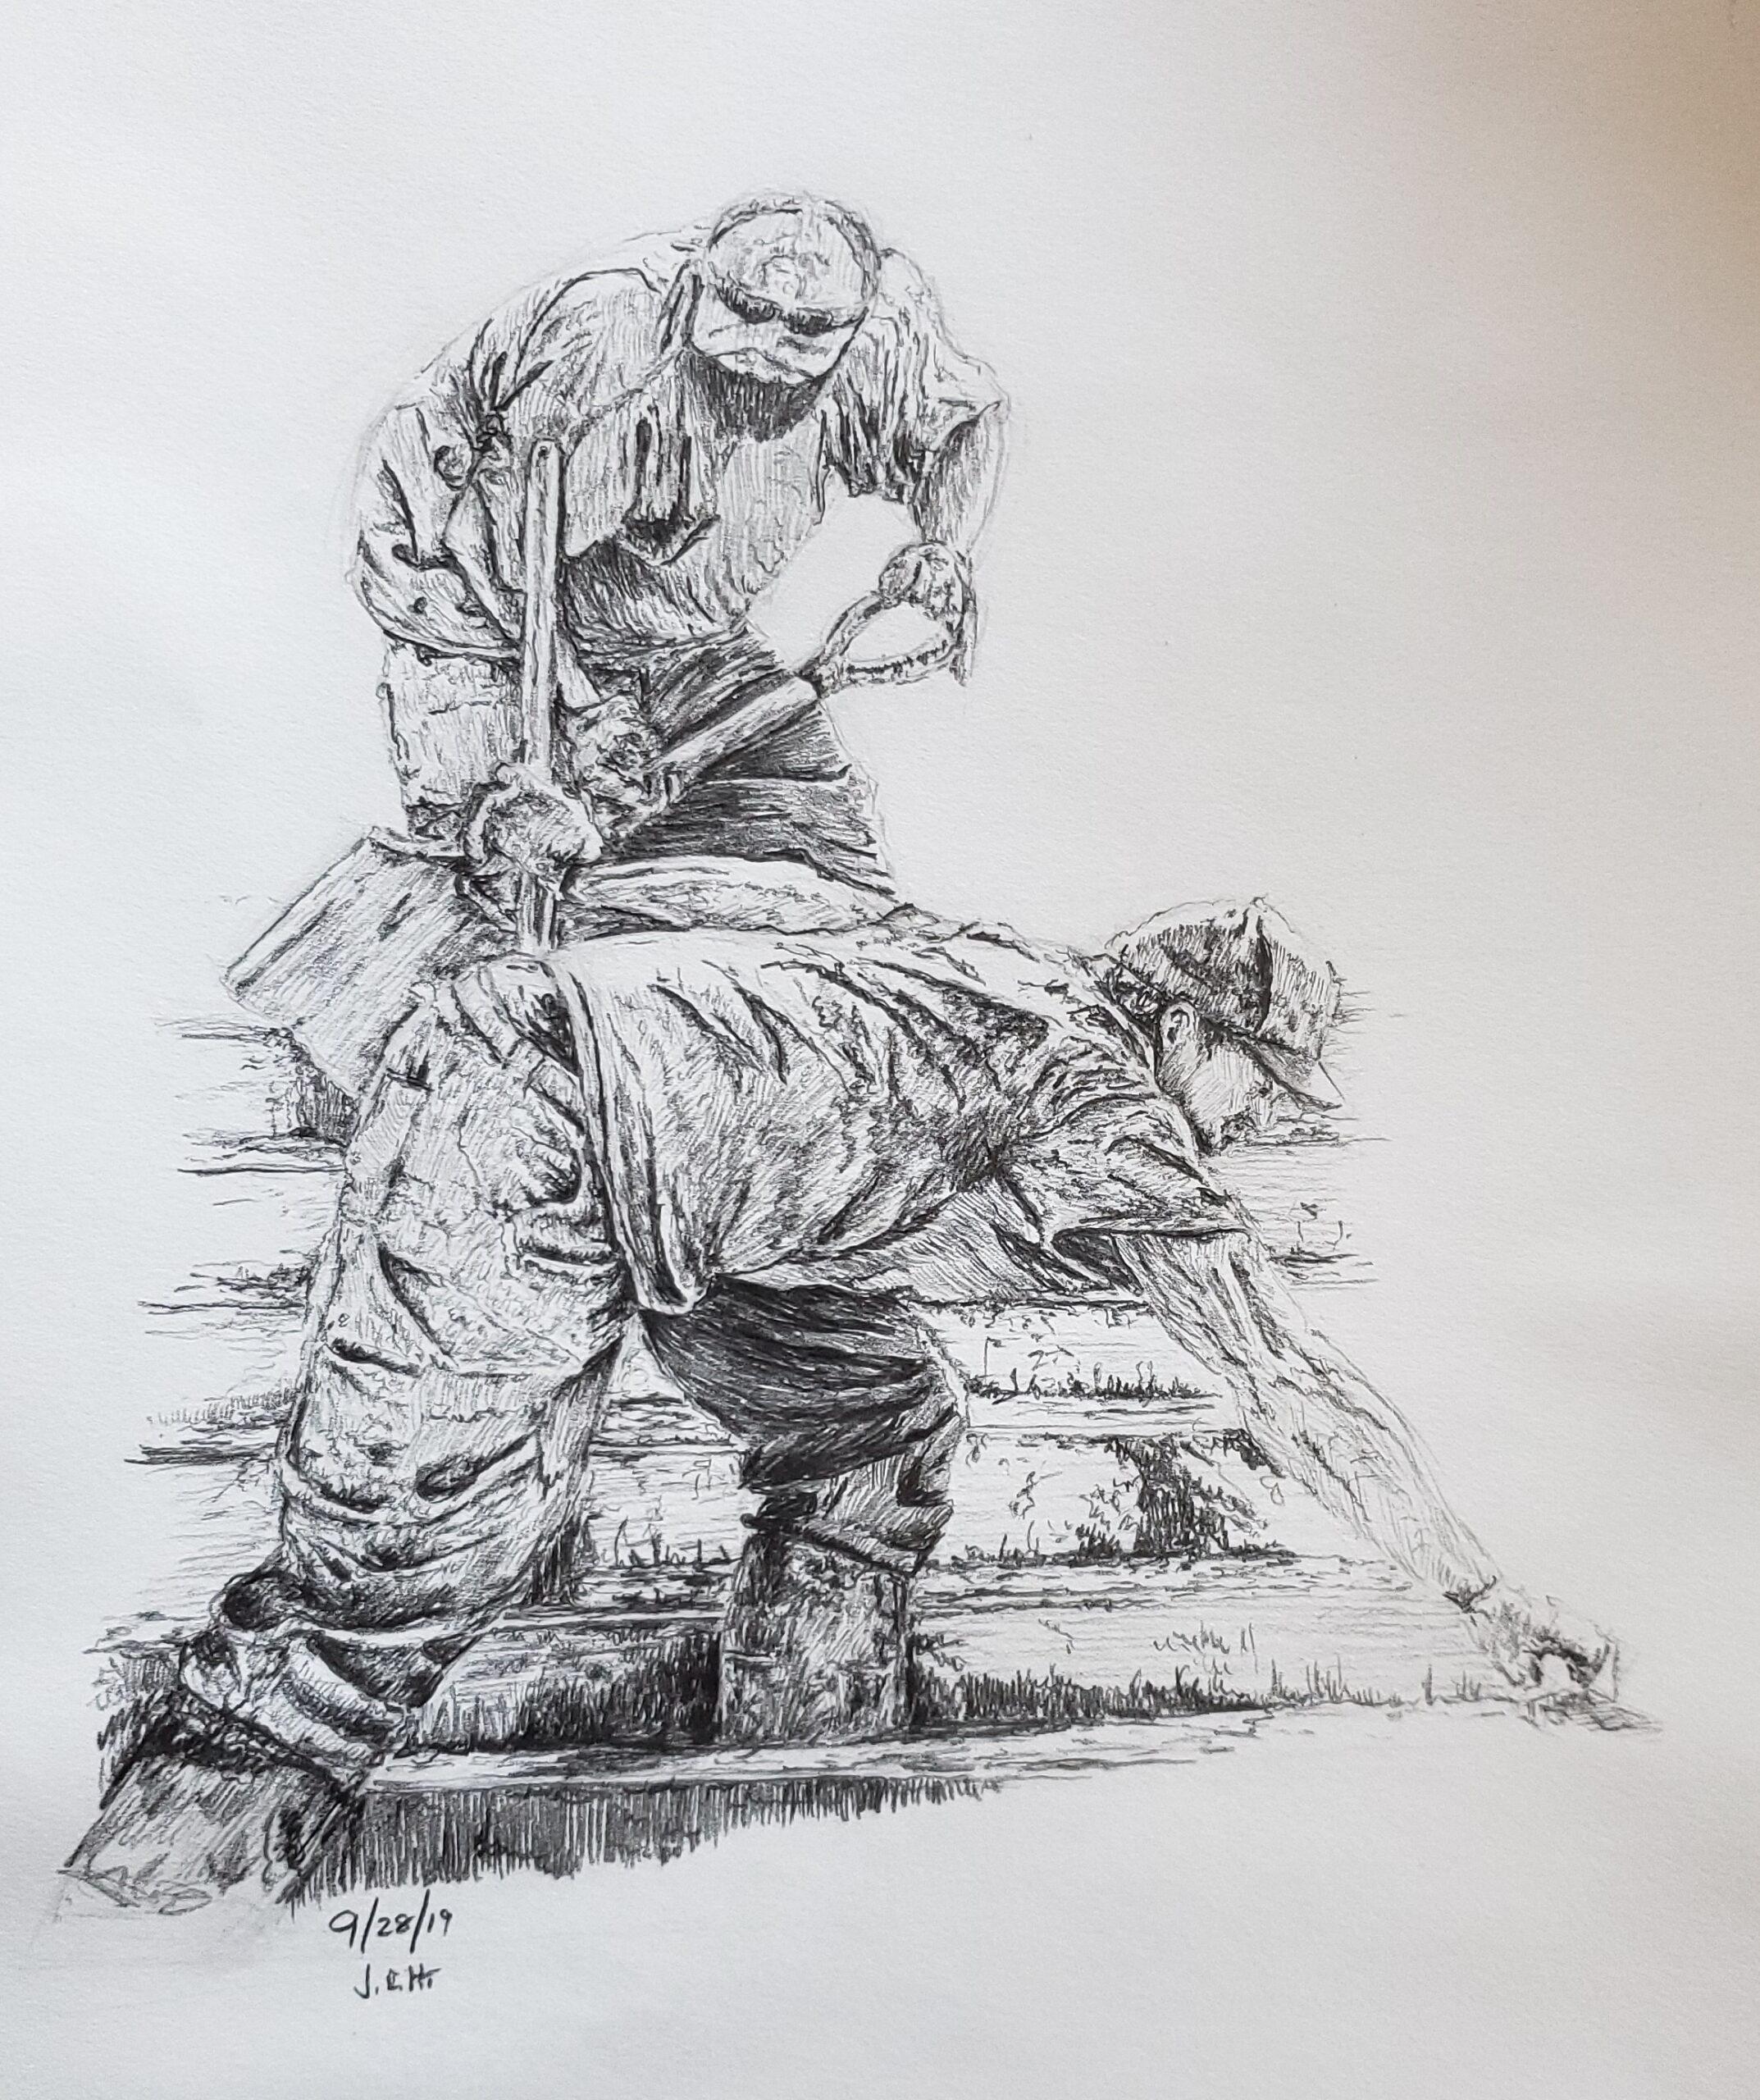 Pencil sketch by John Huisman